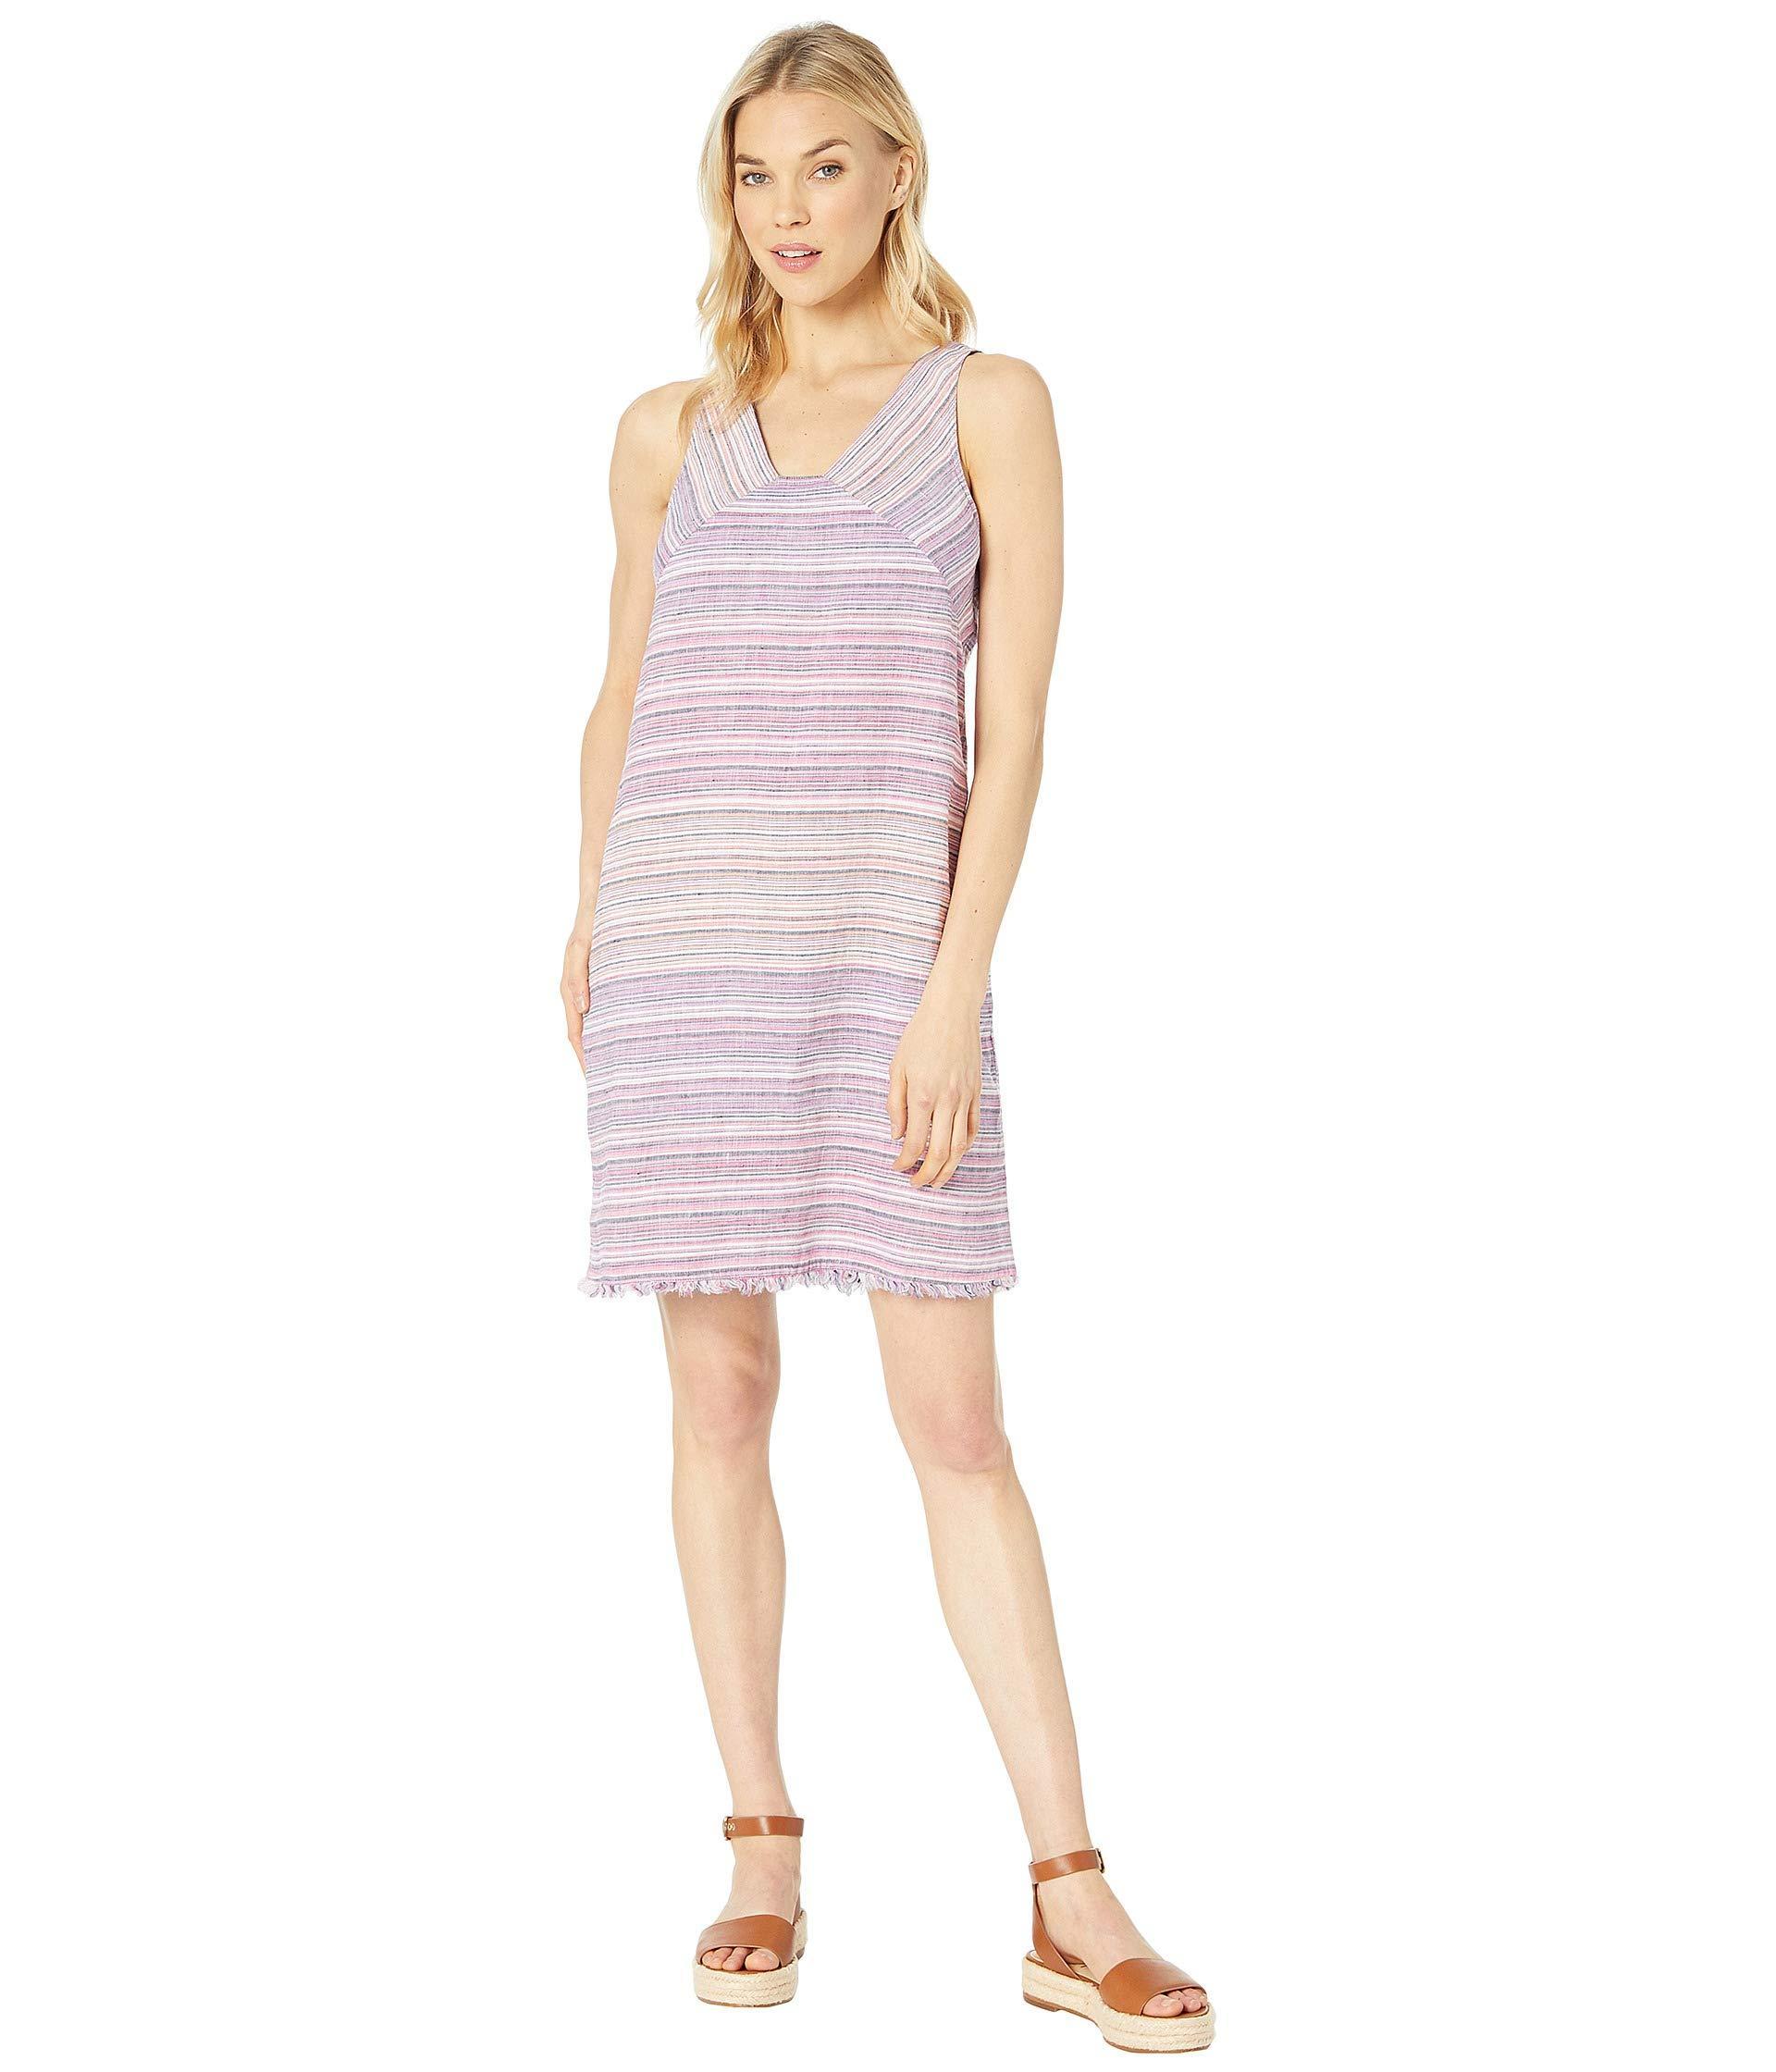 863a0675b6 Lyst - Tommy Bahama Micronesia Stripe Shift Dress (monaco Blue ...